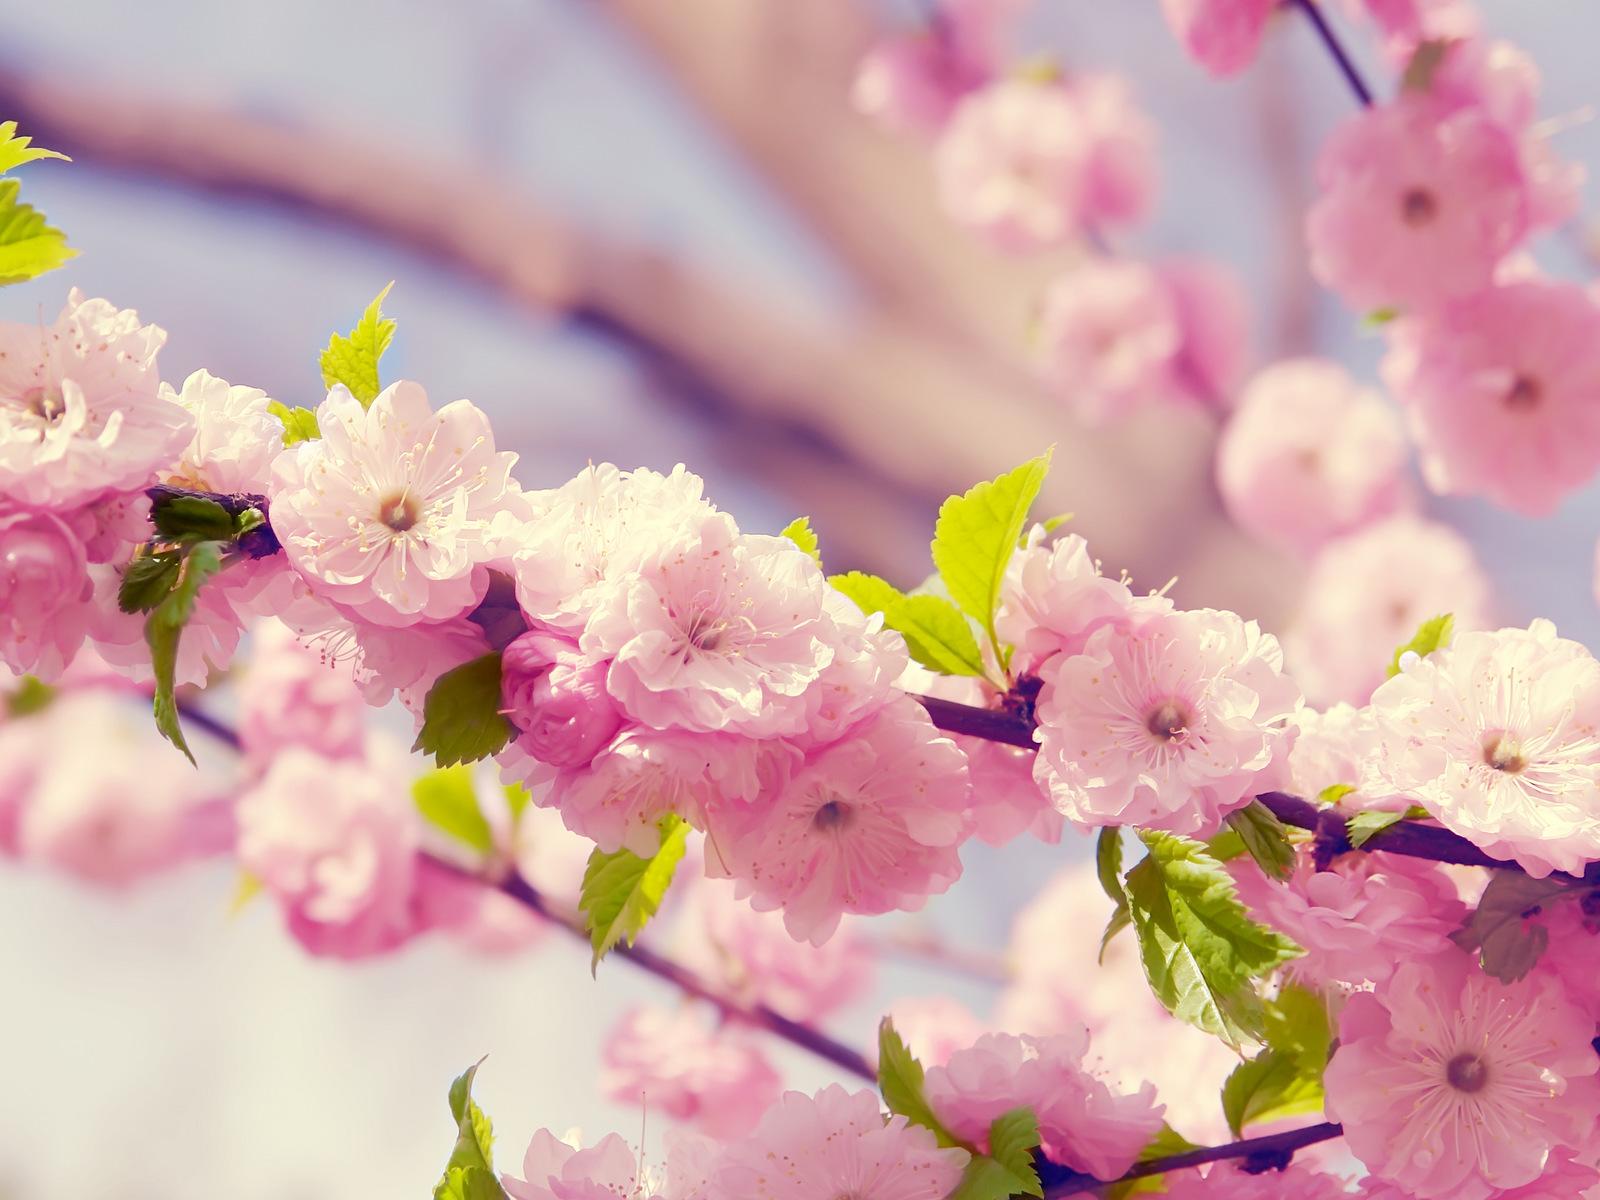 http://img.desktopwallpapers.ru/flowers/pics/e73f1b900391b1c176dd6-1600.jpg